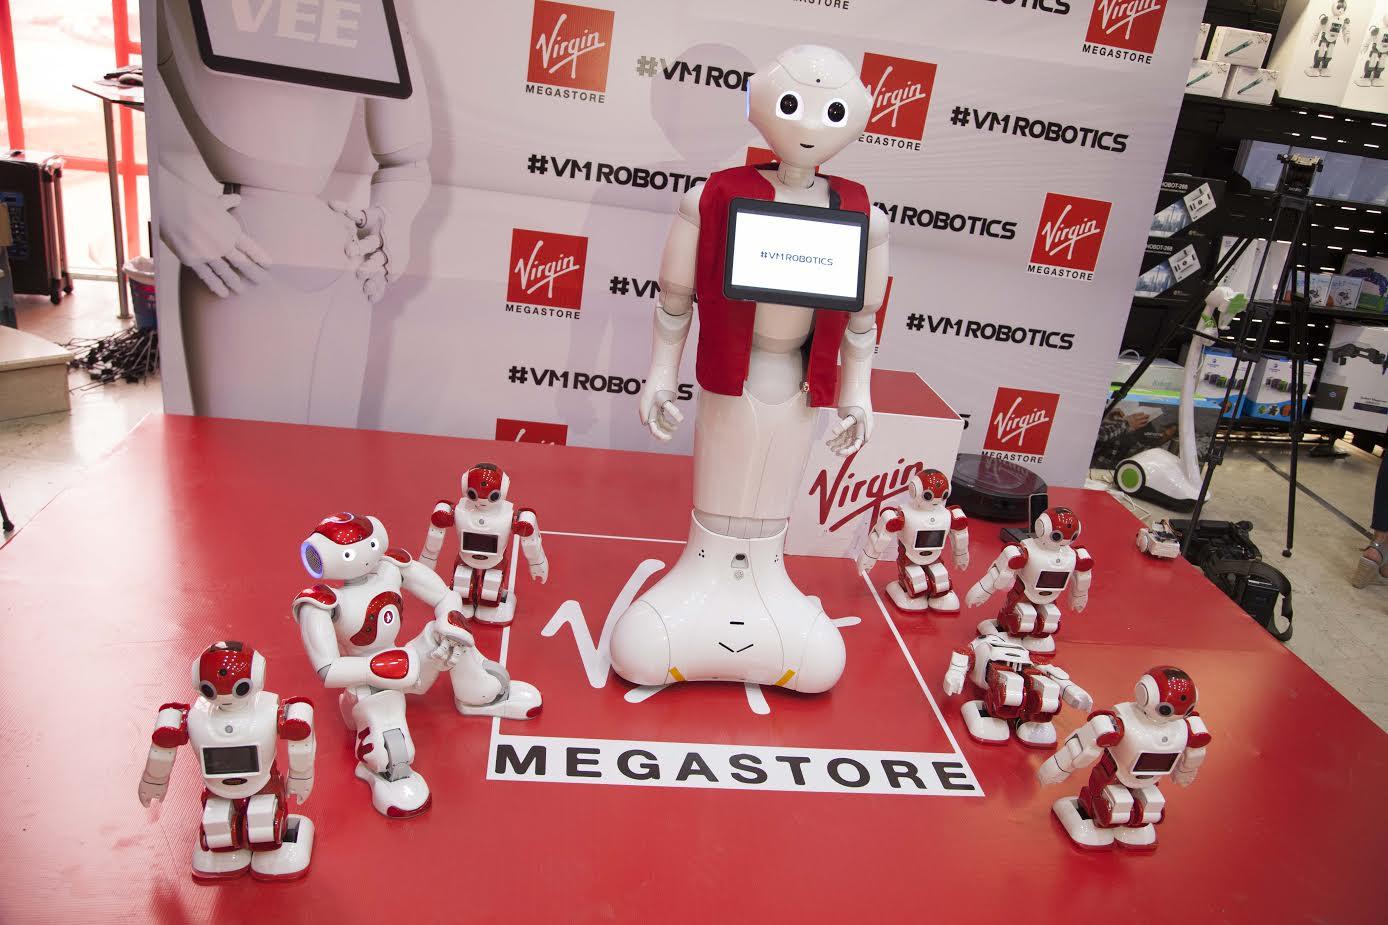 Social Interactive Robotics Land In Virgin Megastore Lebanon Mid